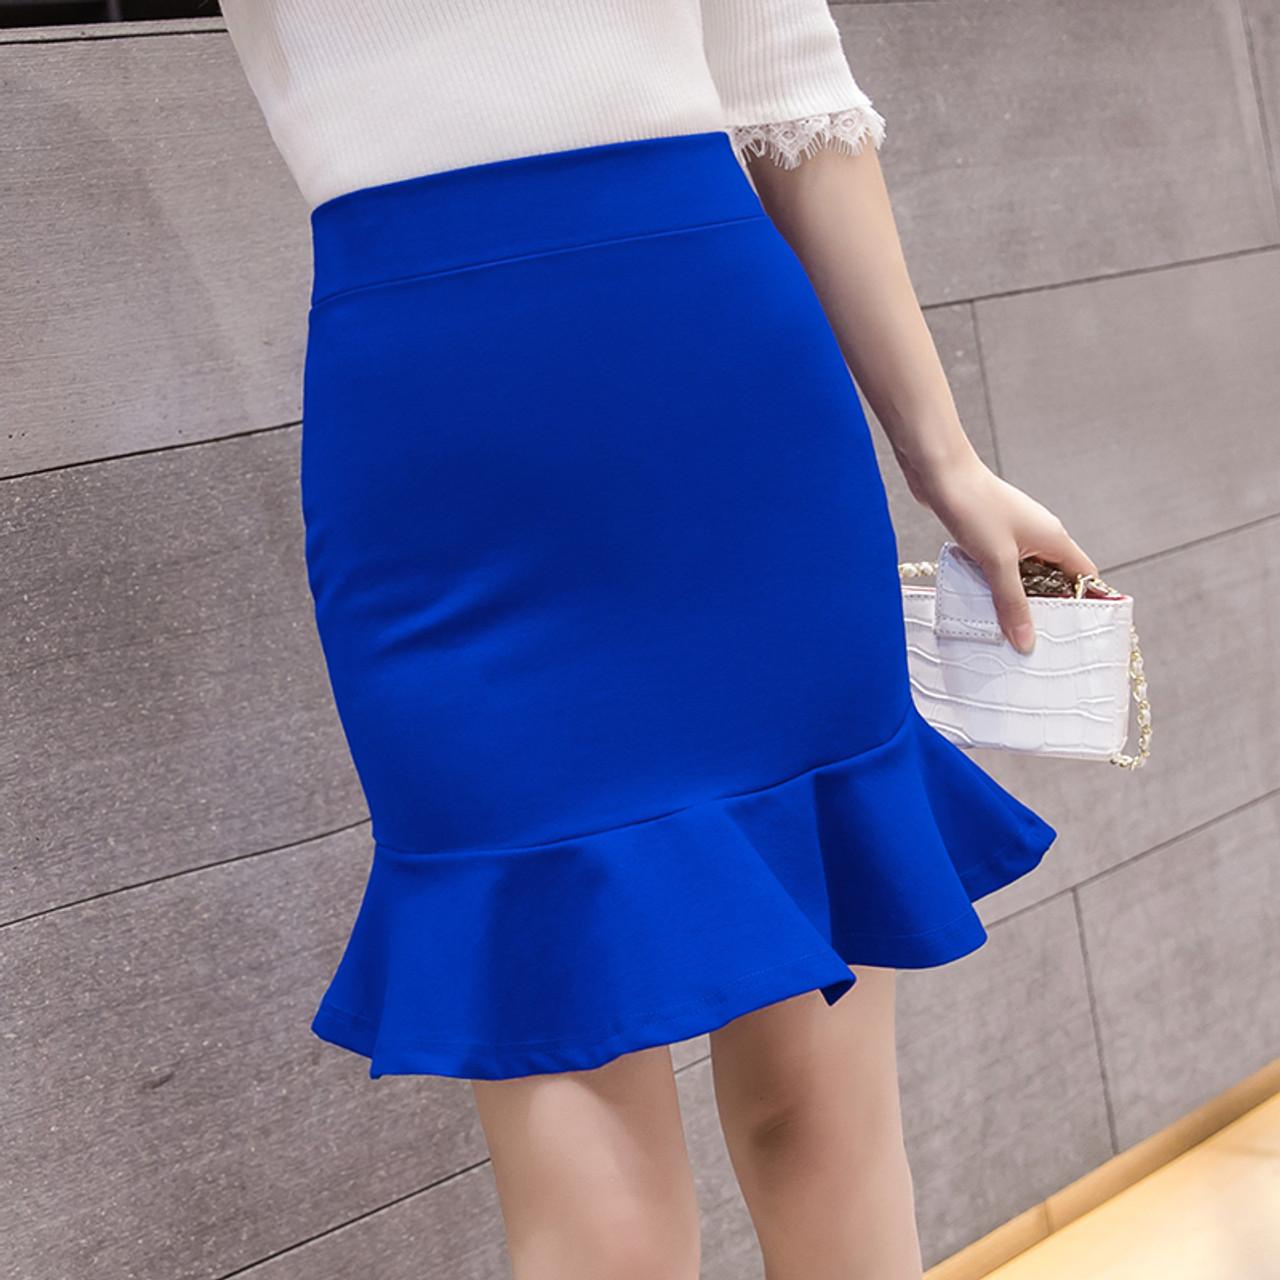 a05b6ed59f07 2018 Women Short Pencil Skirt Slim Bodycon High Waist Ruffles Hem Mermaid  Solid Mini Skirt Ladies ...